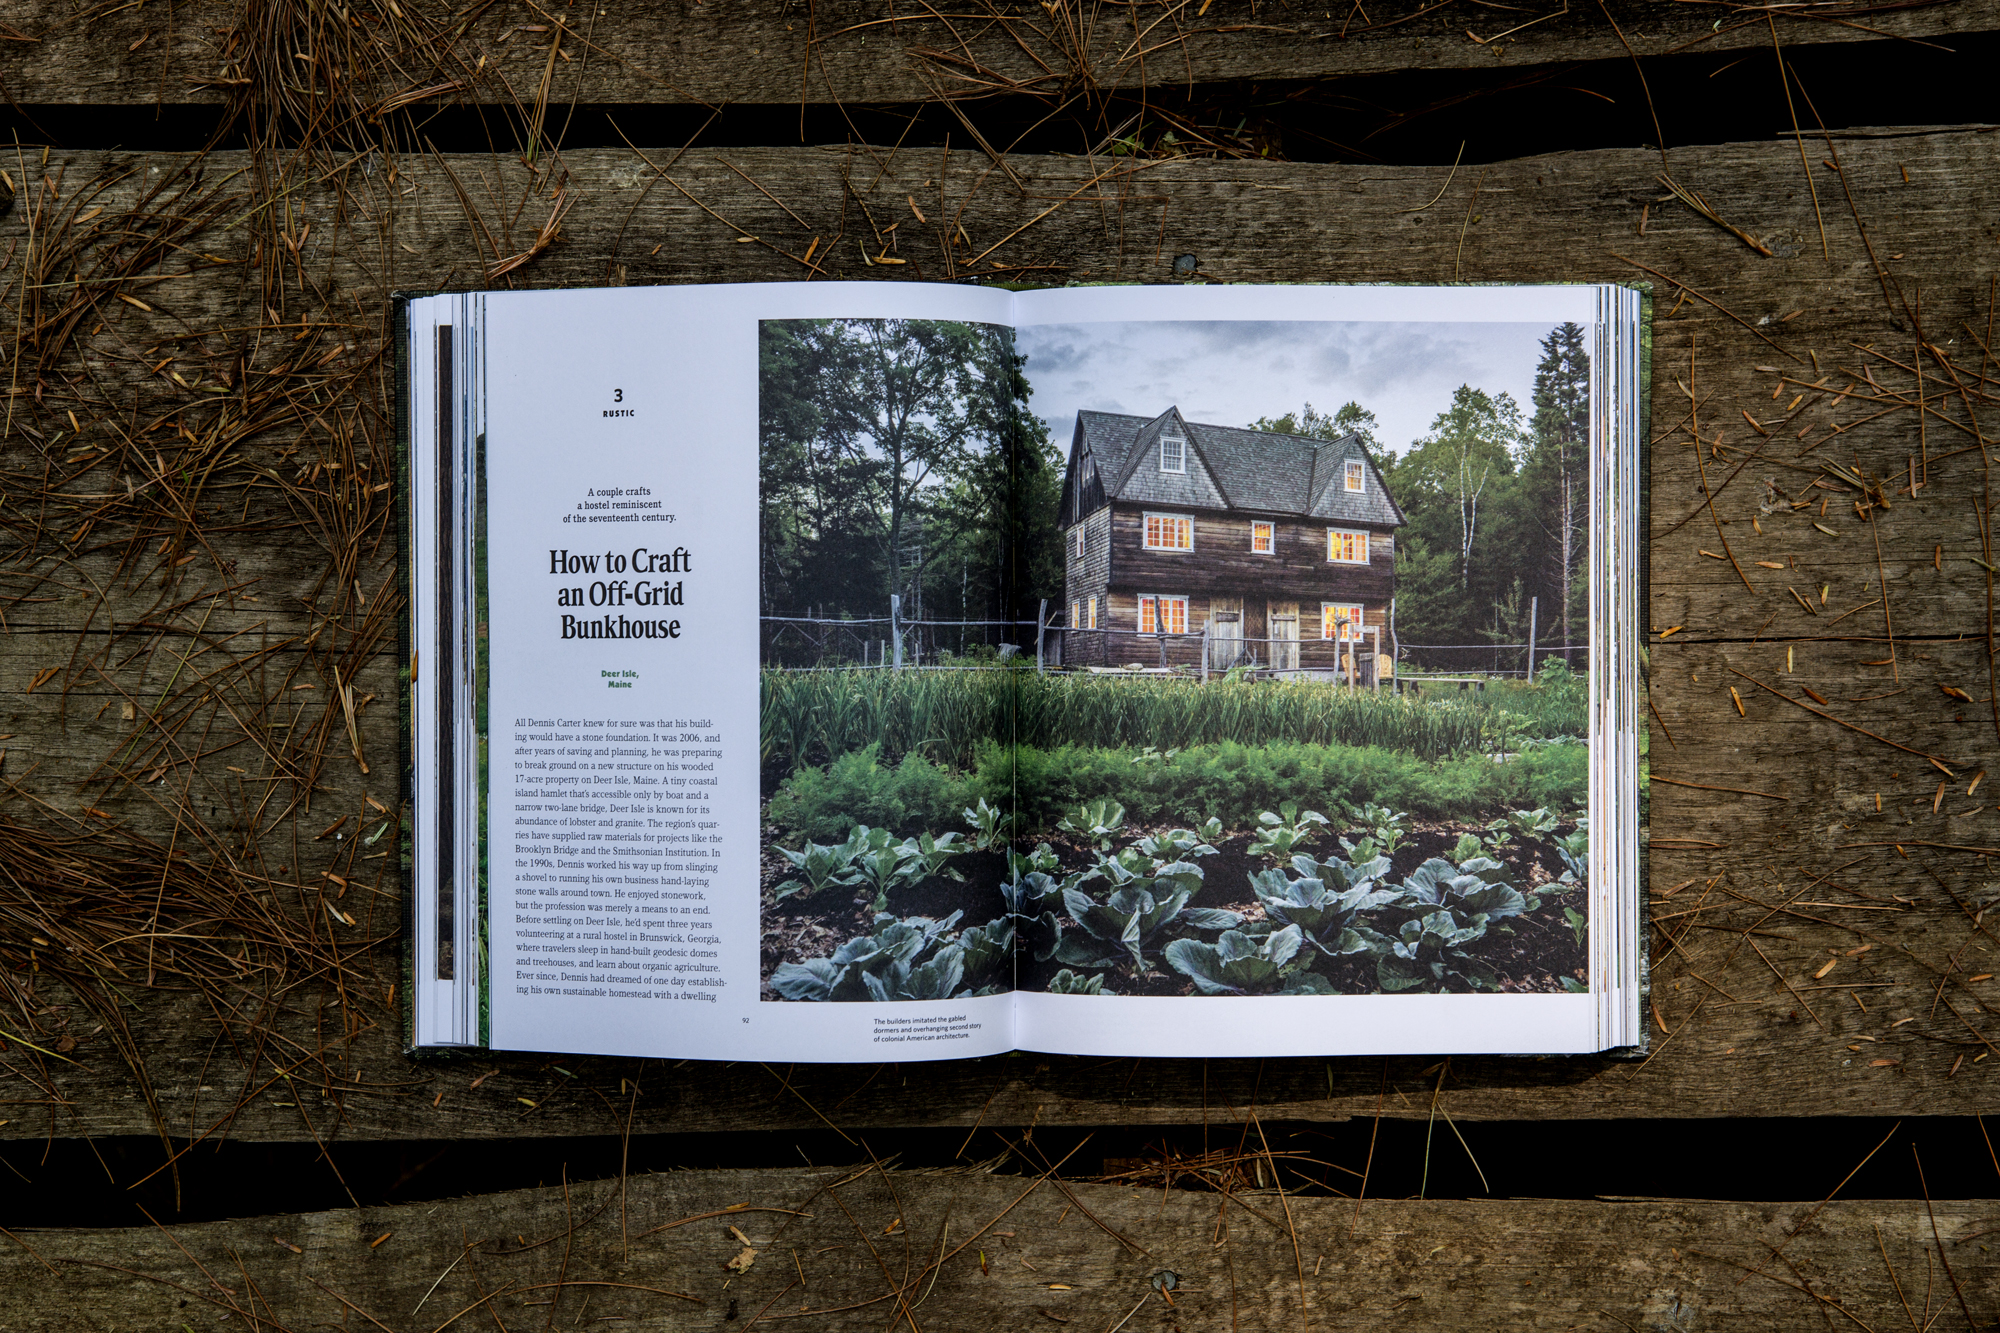 beaver-brook-cabin-porn-book-3